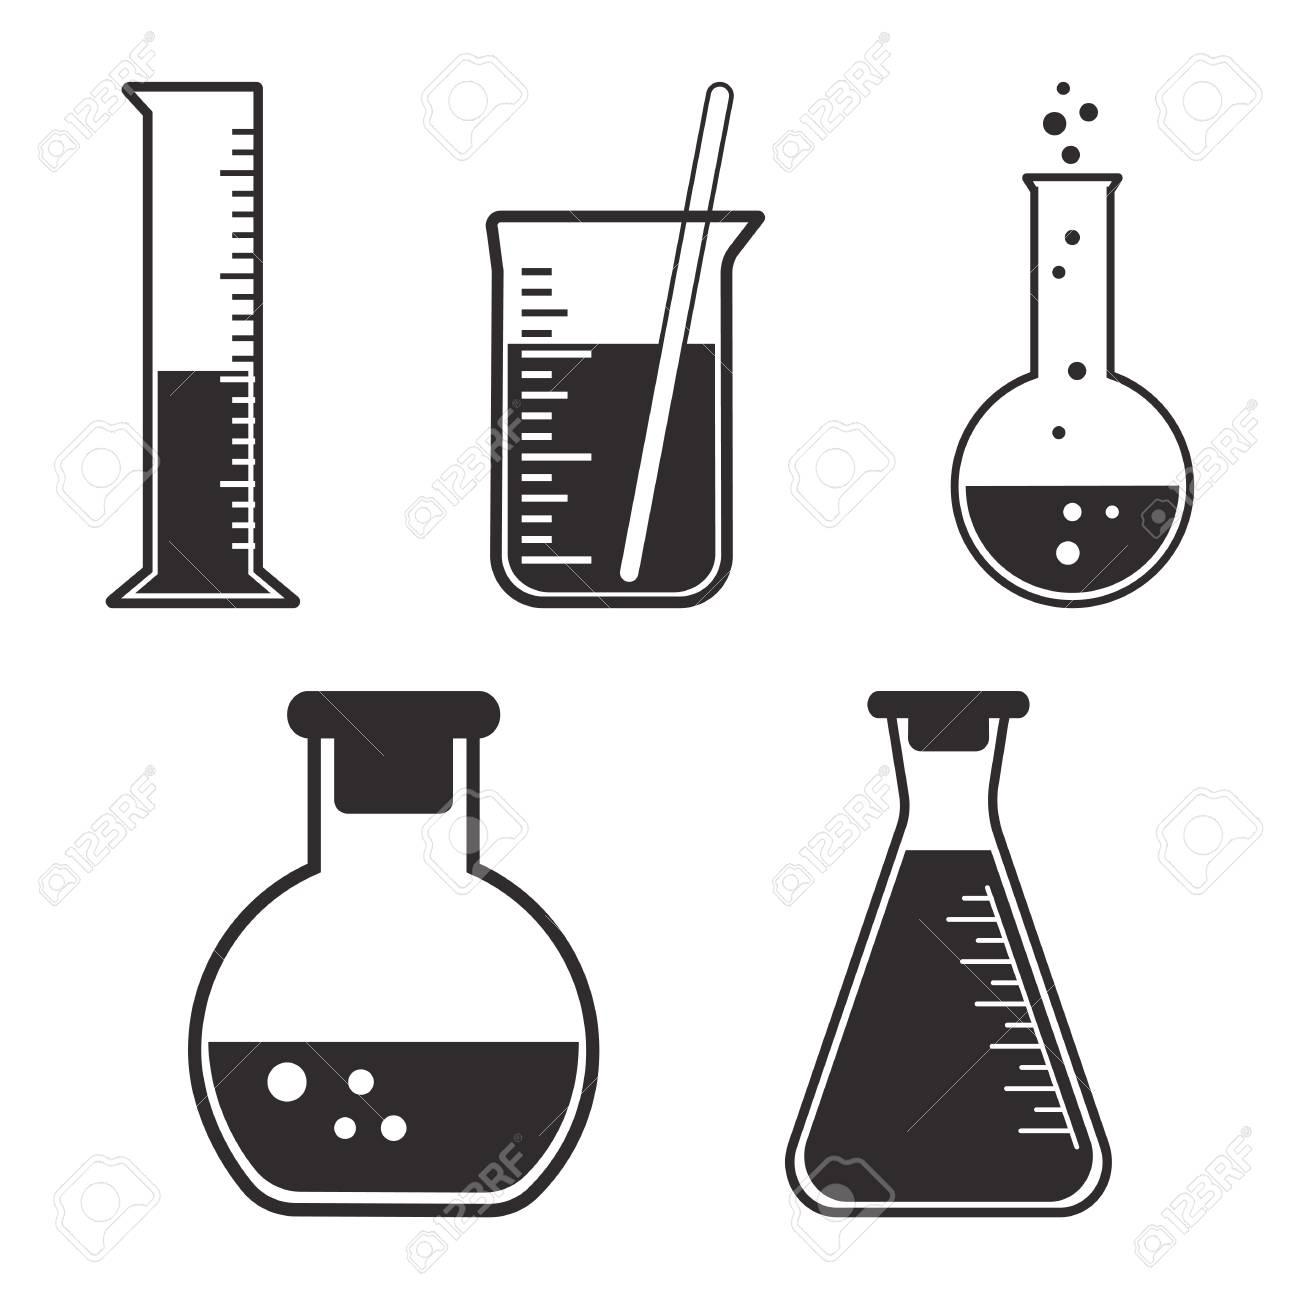 Chemistry Clip Art Chemistry Clipart Fans - Chemistry Lab Experiment Clipart  - Free Transparent PNG Clipart Images Download